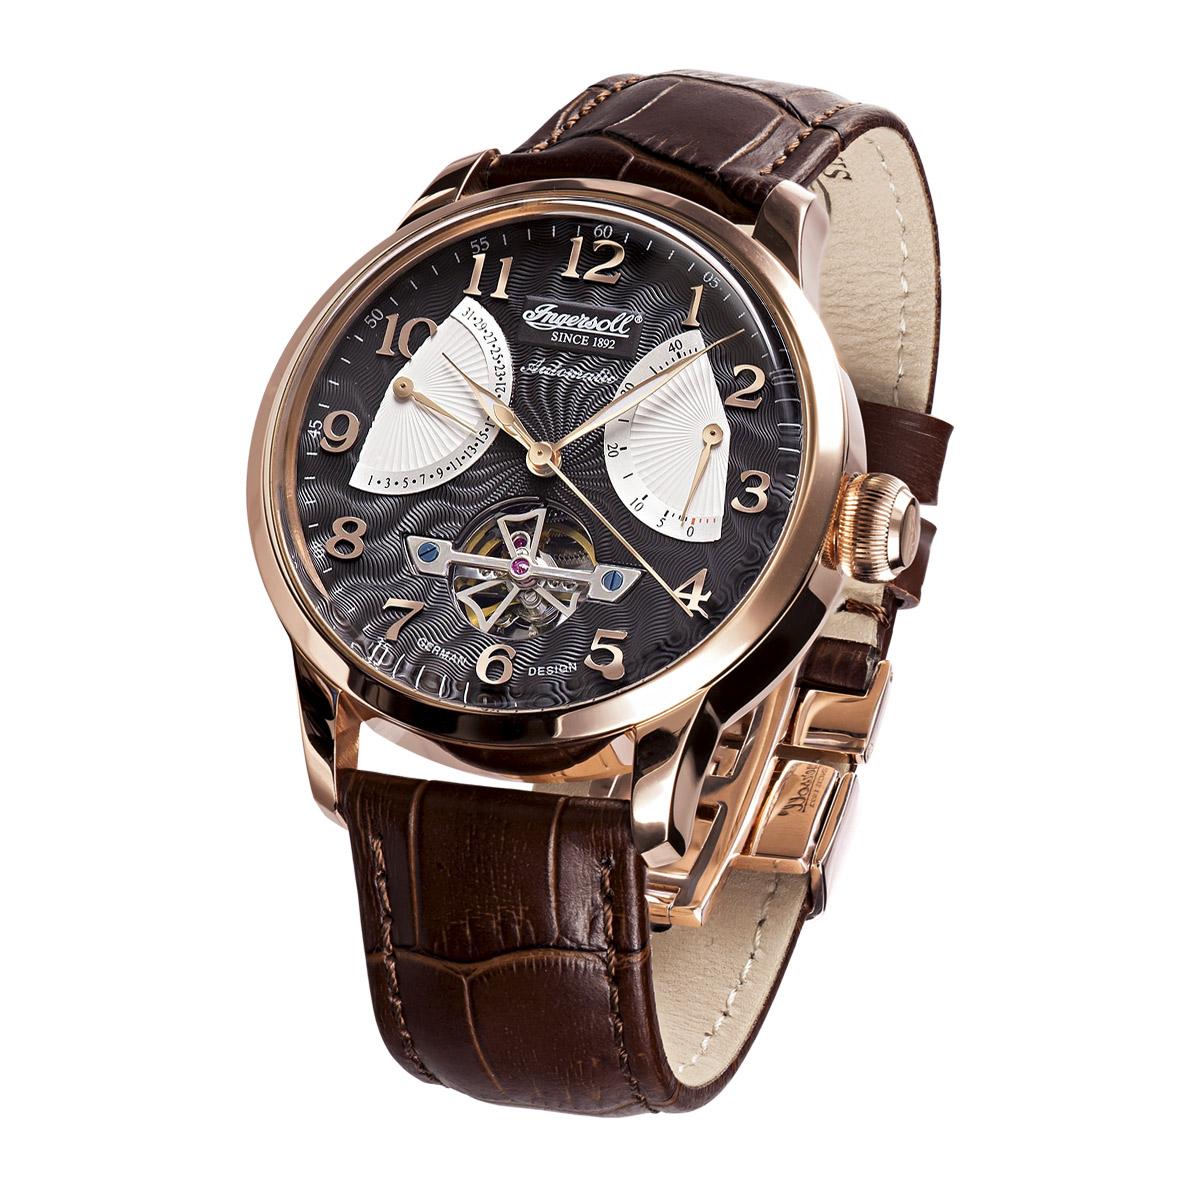 Ingersoll Classic Stetson II IN6910RBK Massa Herren Armbanduhr Automatikuhr